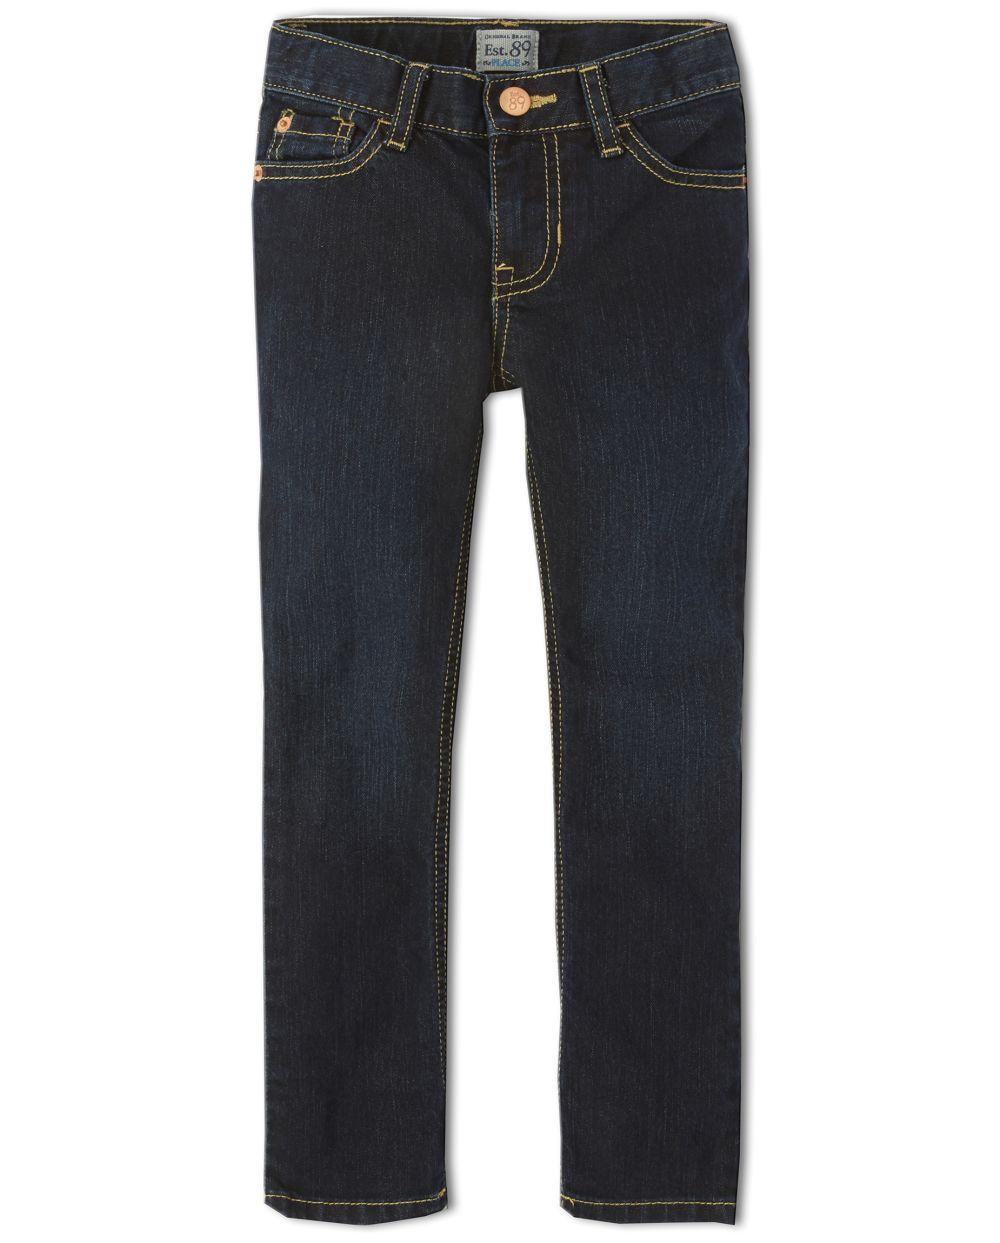 Top Girls Basic Skinny Jeans